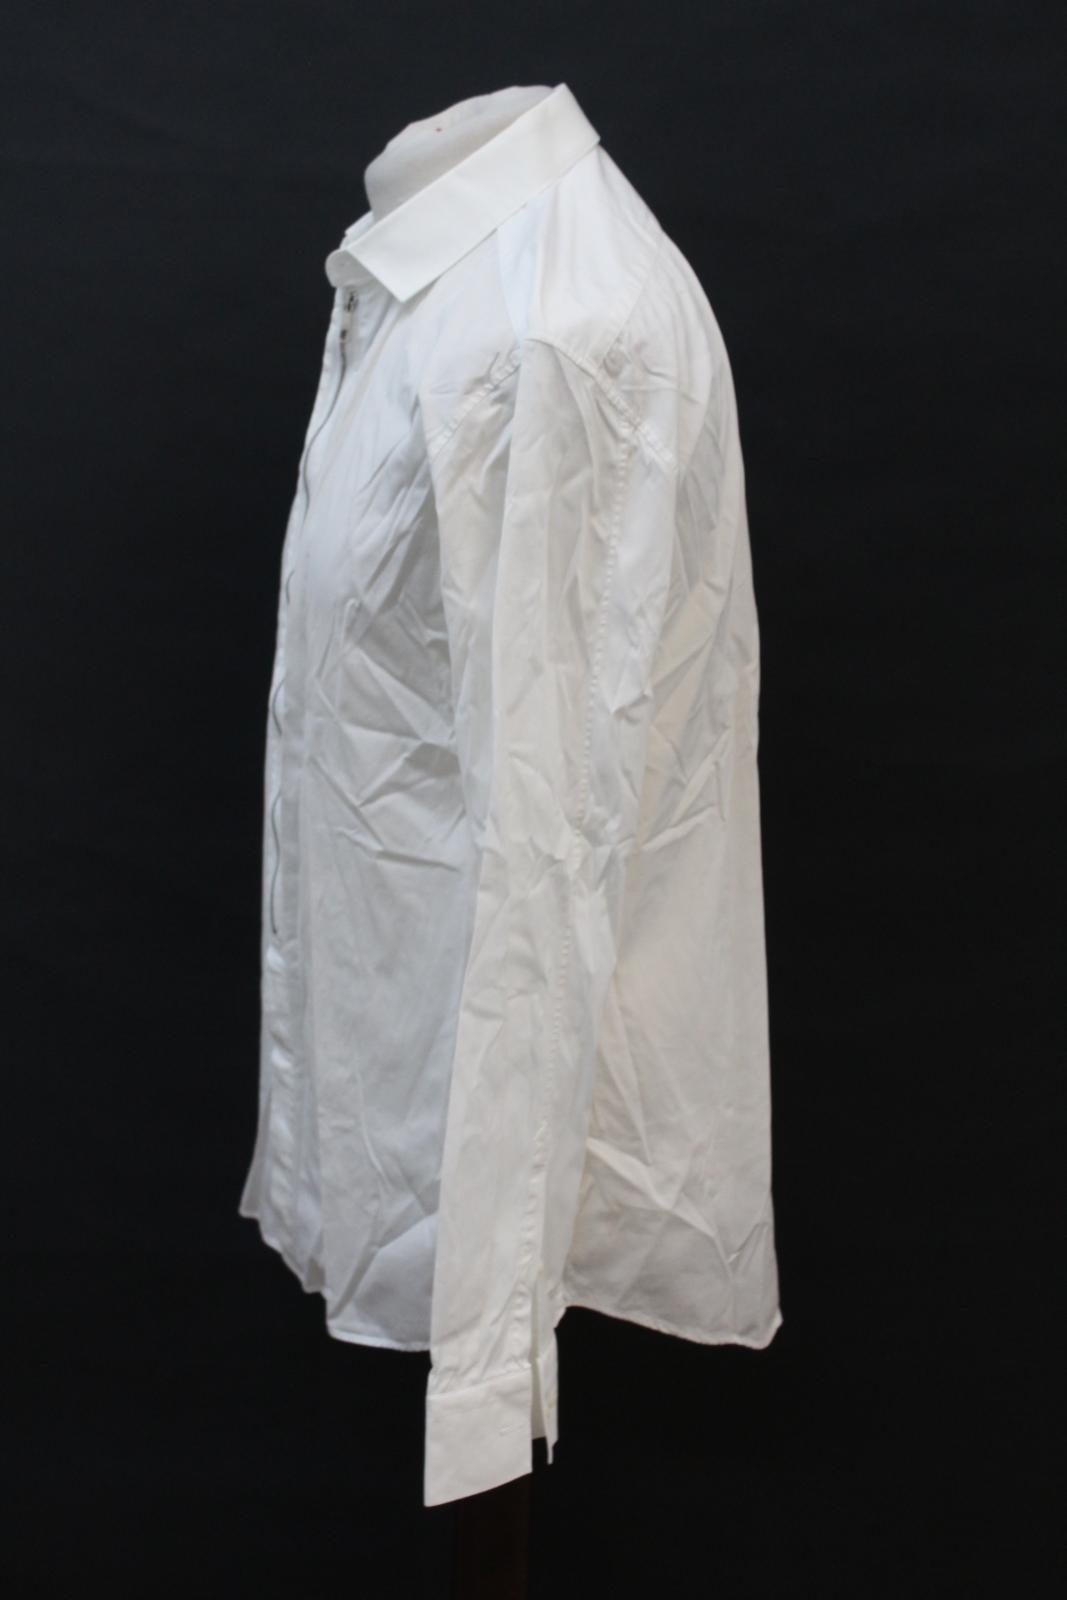 Neil-Barrett-para-hombre-calce-cenido-de-algodon-Blanco-Detalle-De-Cremallera-Botones-Camisa-Cuello miniatura 6